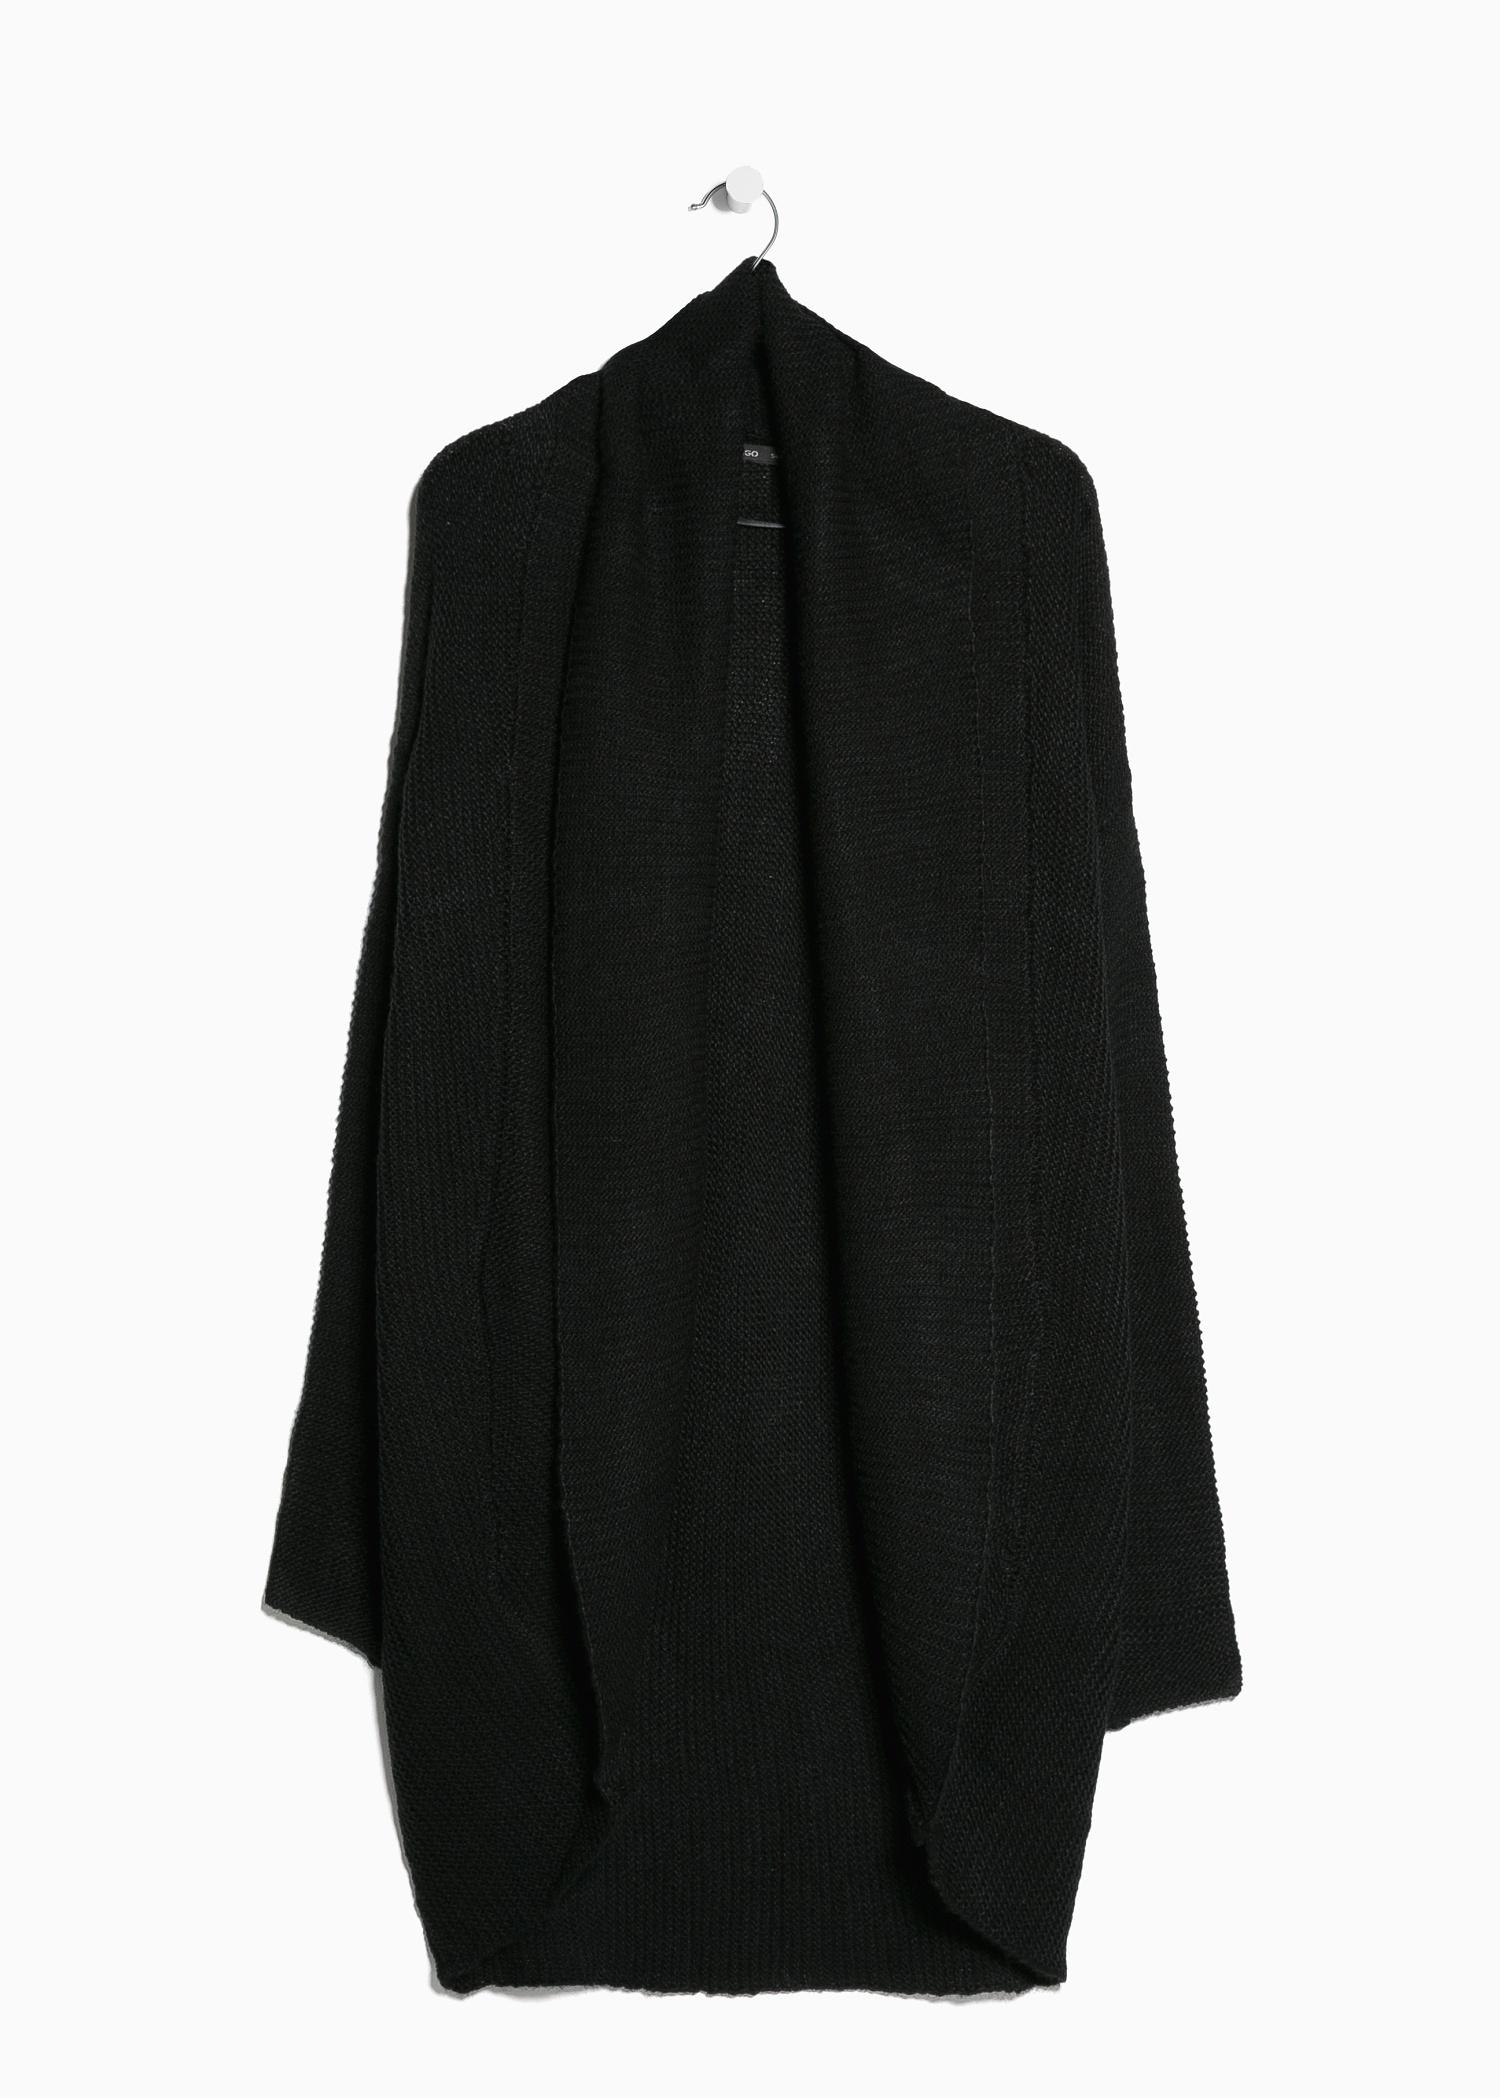 Mango Lapel Wool-Blend Cardigan in Black | Lyst